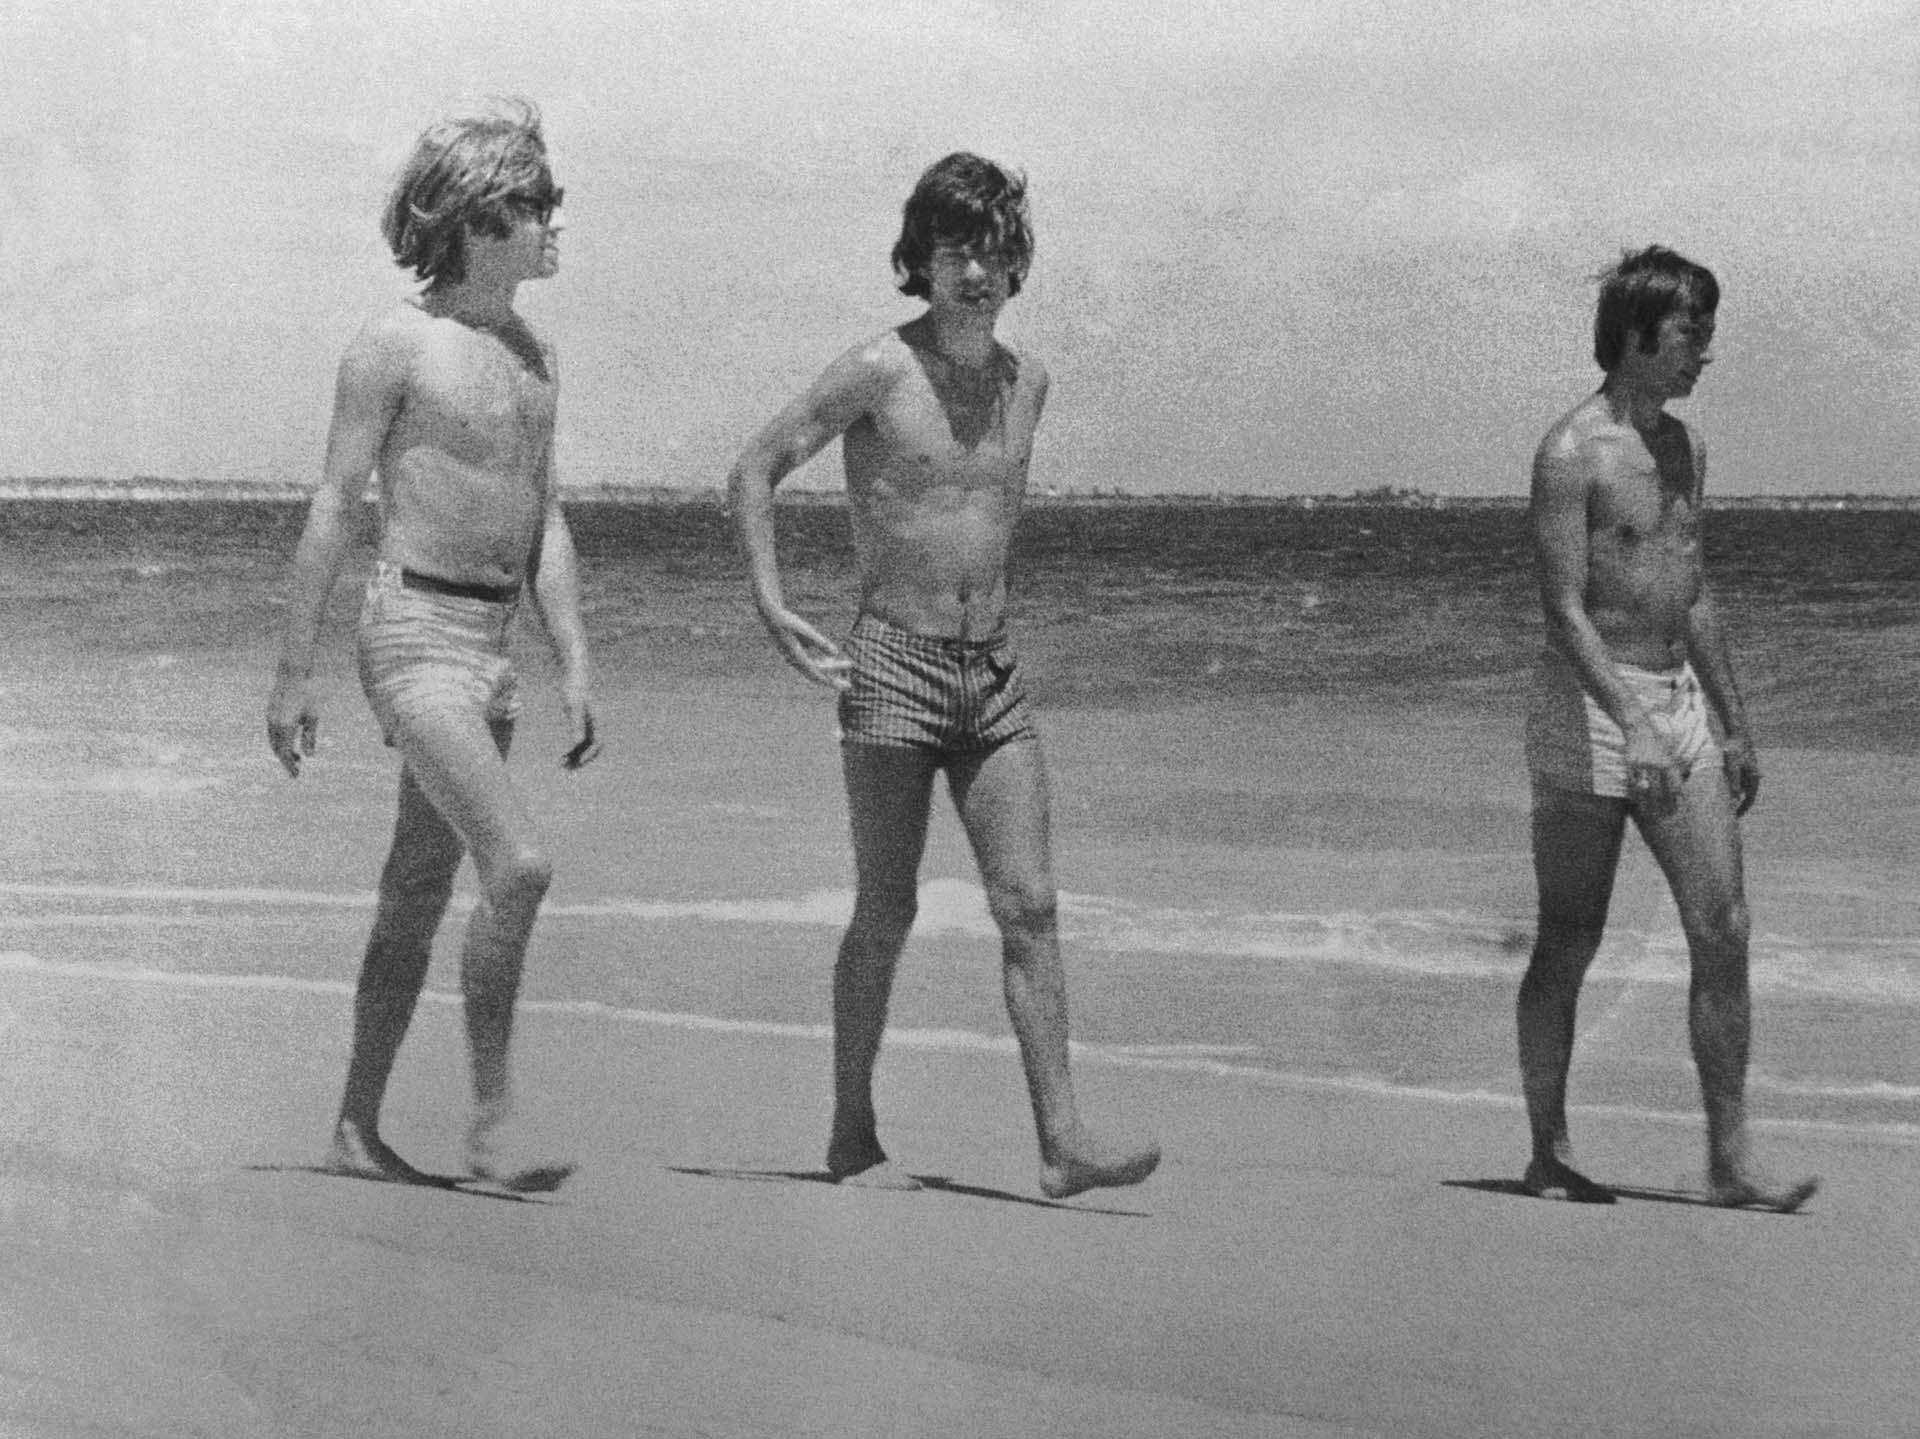 Los Rolling Stones Brian Jones, Mick Jagger y Charlie Watts en la playa en Australia, 1965.